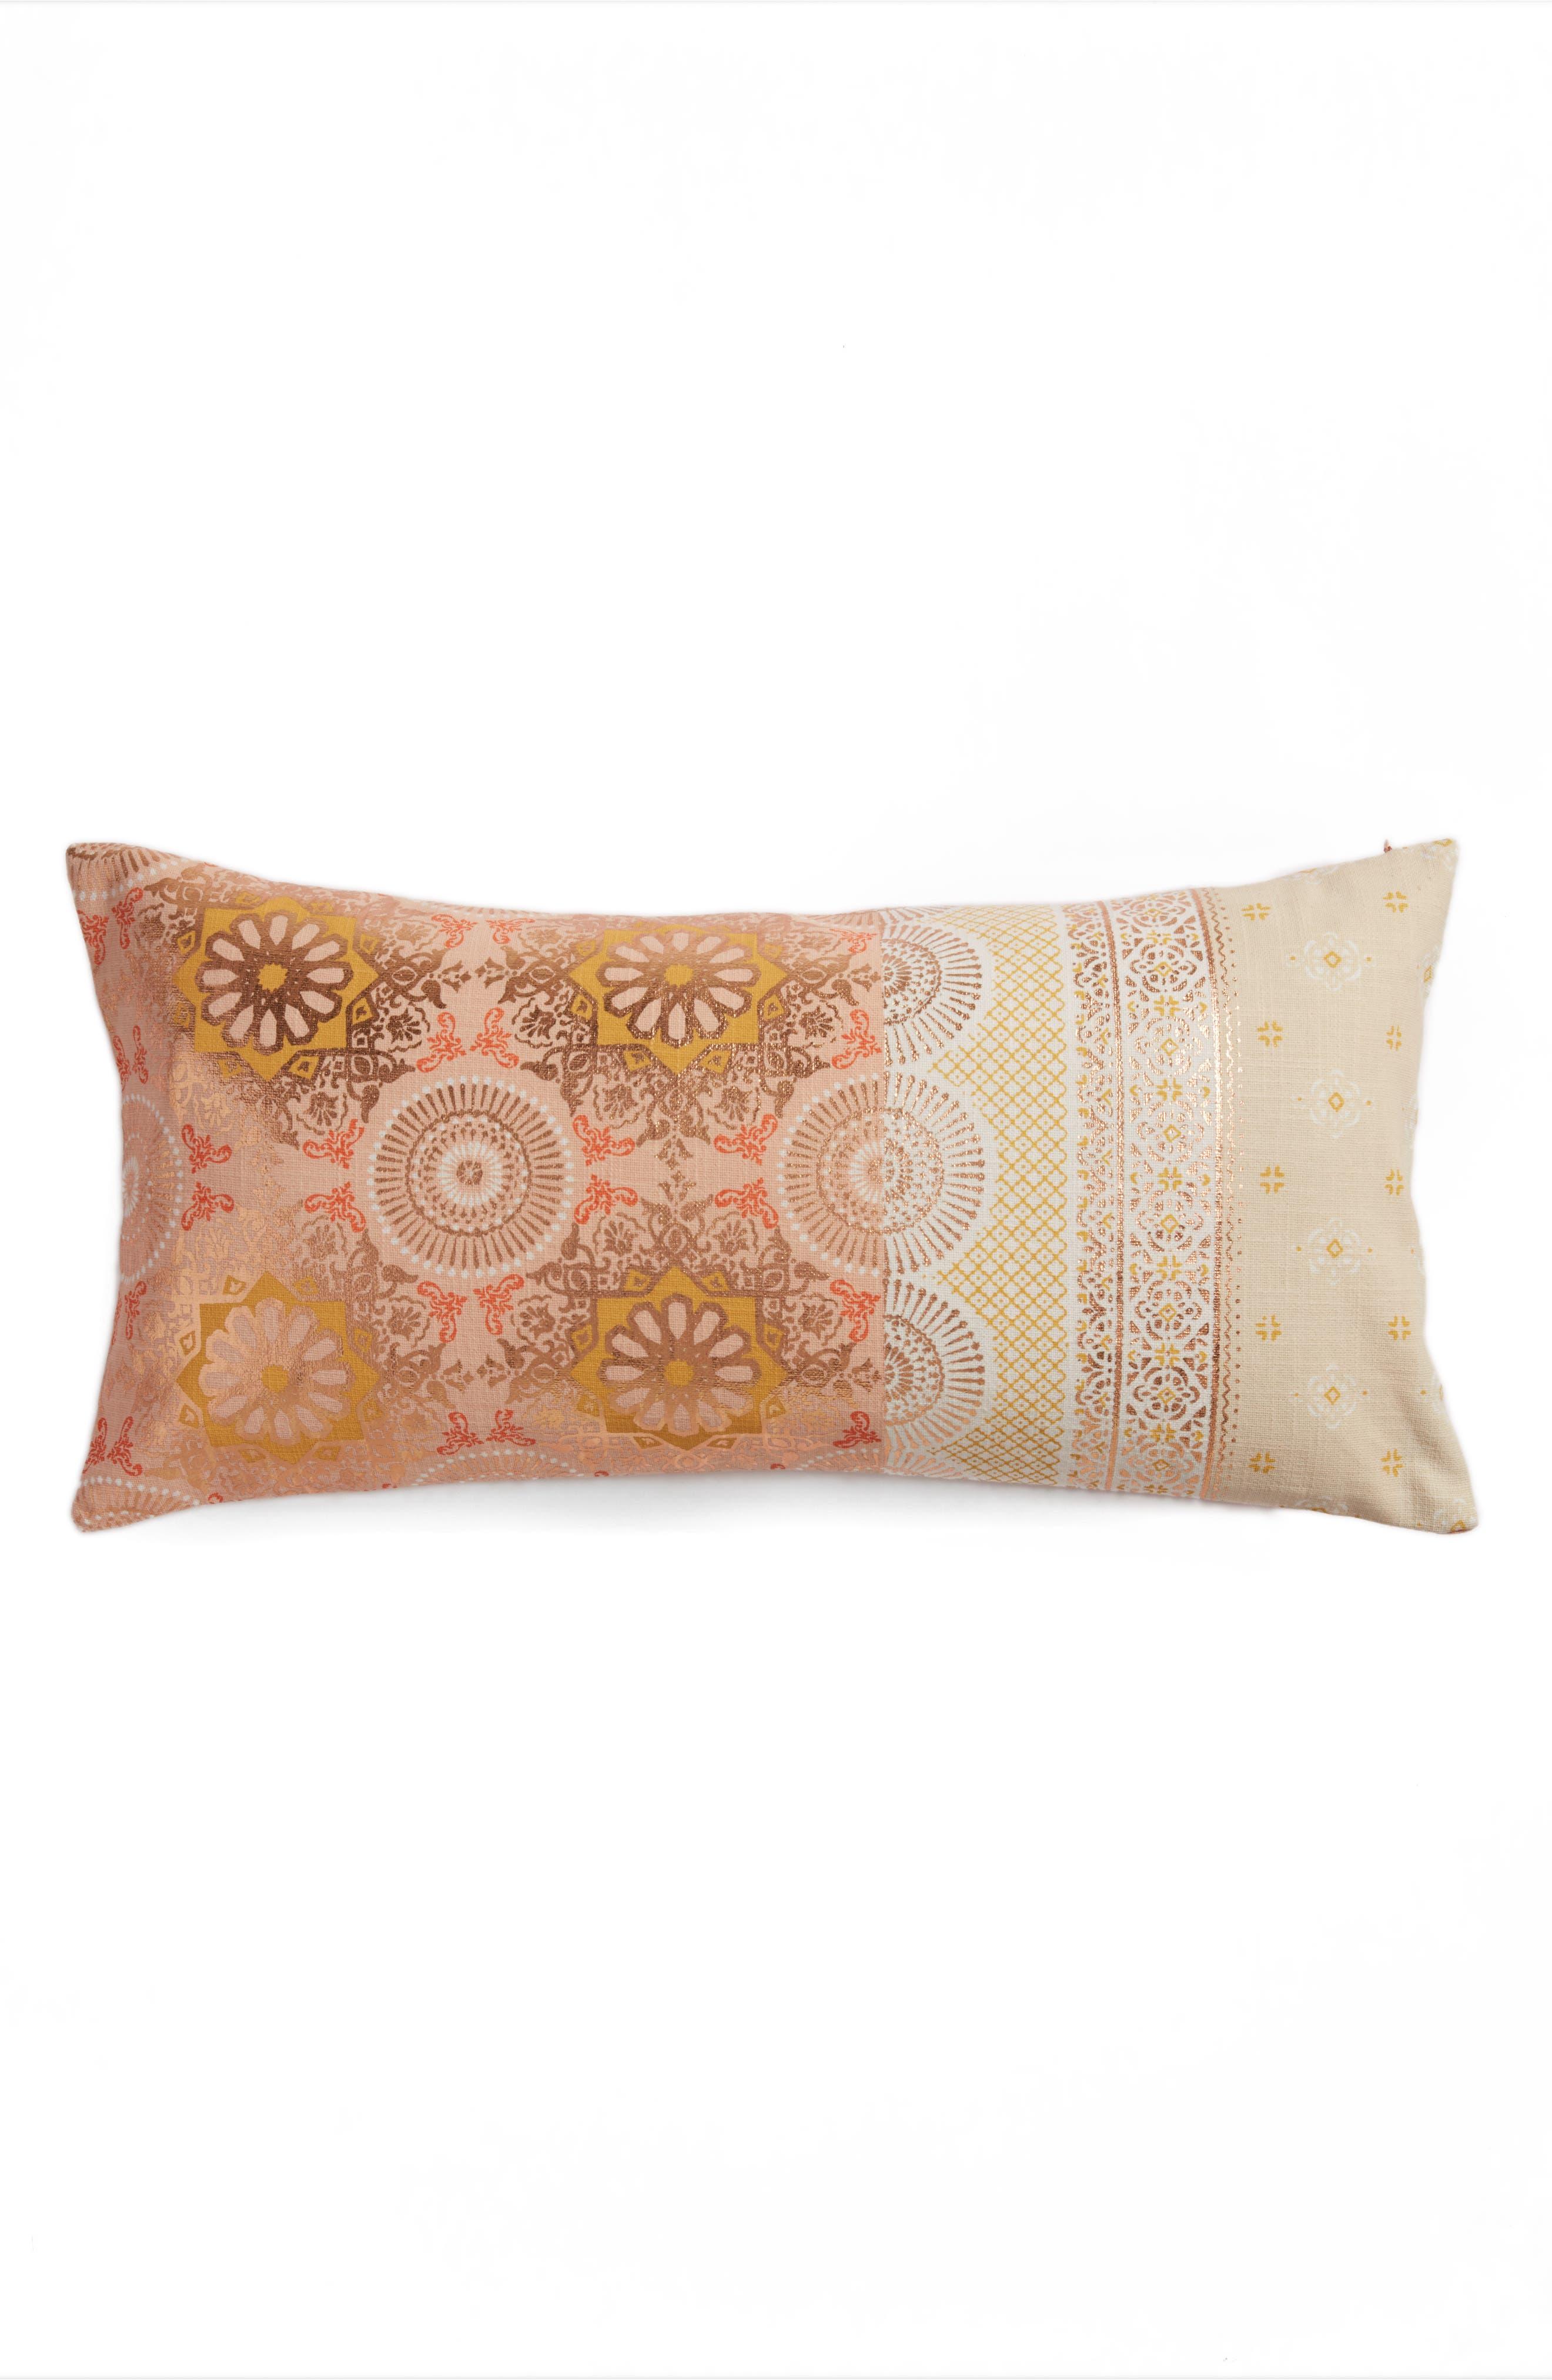 Moroccan Print Accent Pillow,                             Main thumbnail 1, color,                             650